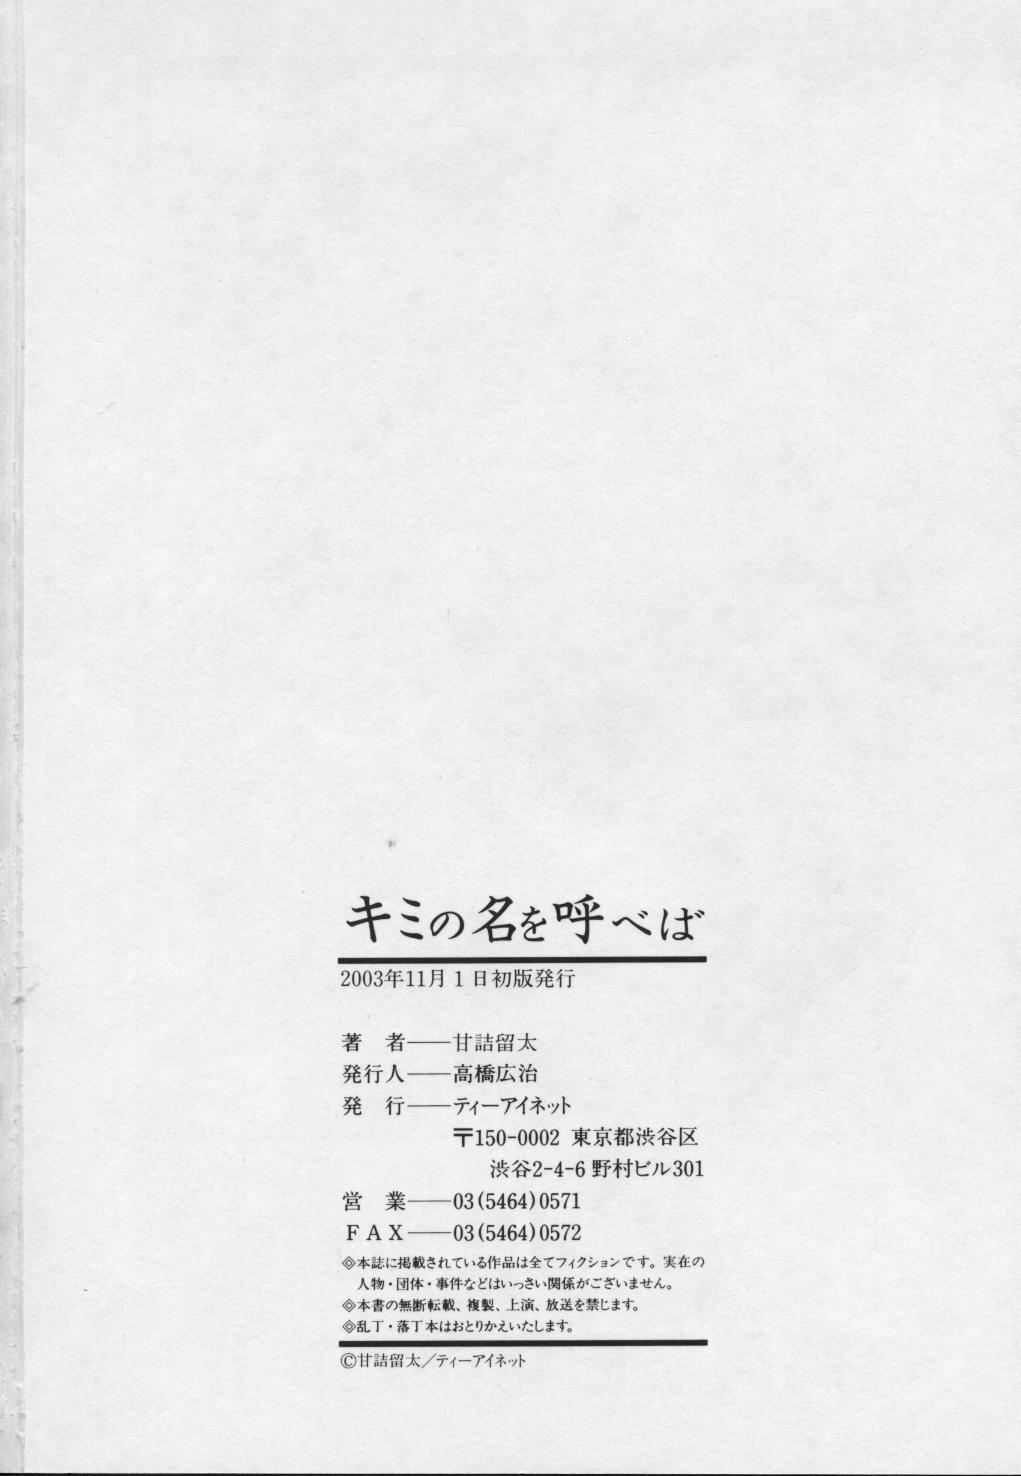 Kimi no Na o Yobeba - If I call your name. 185